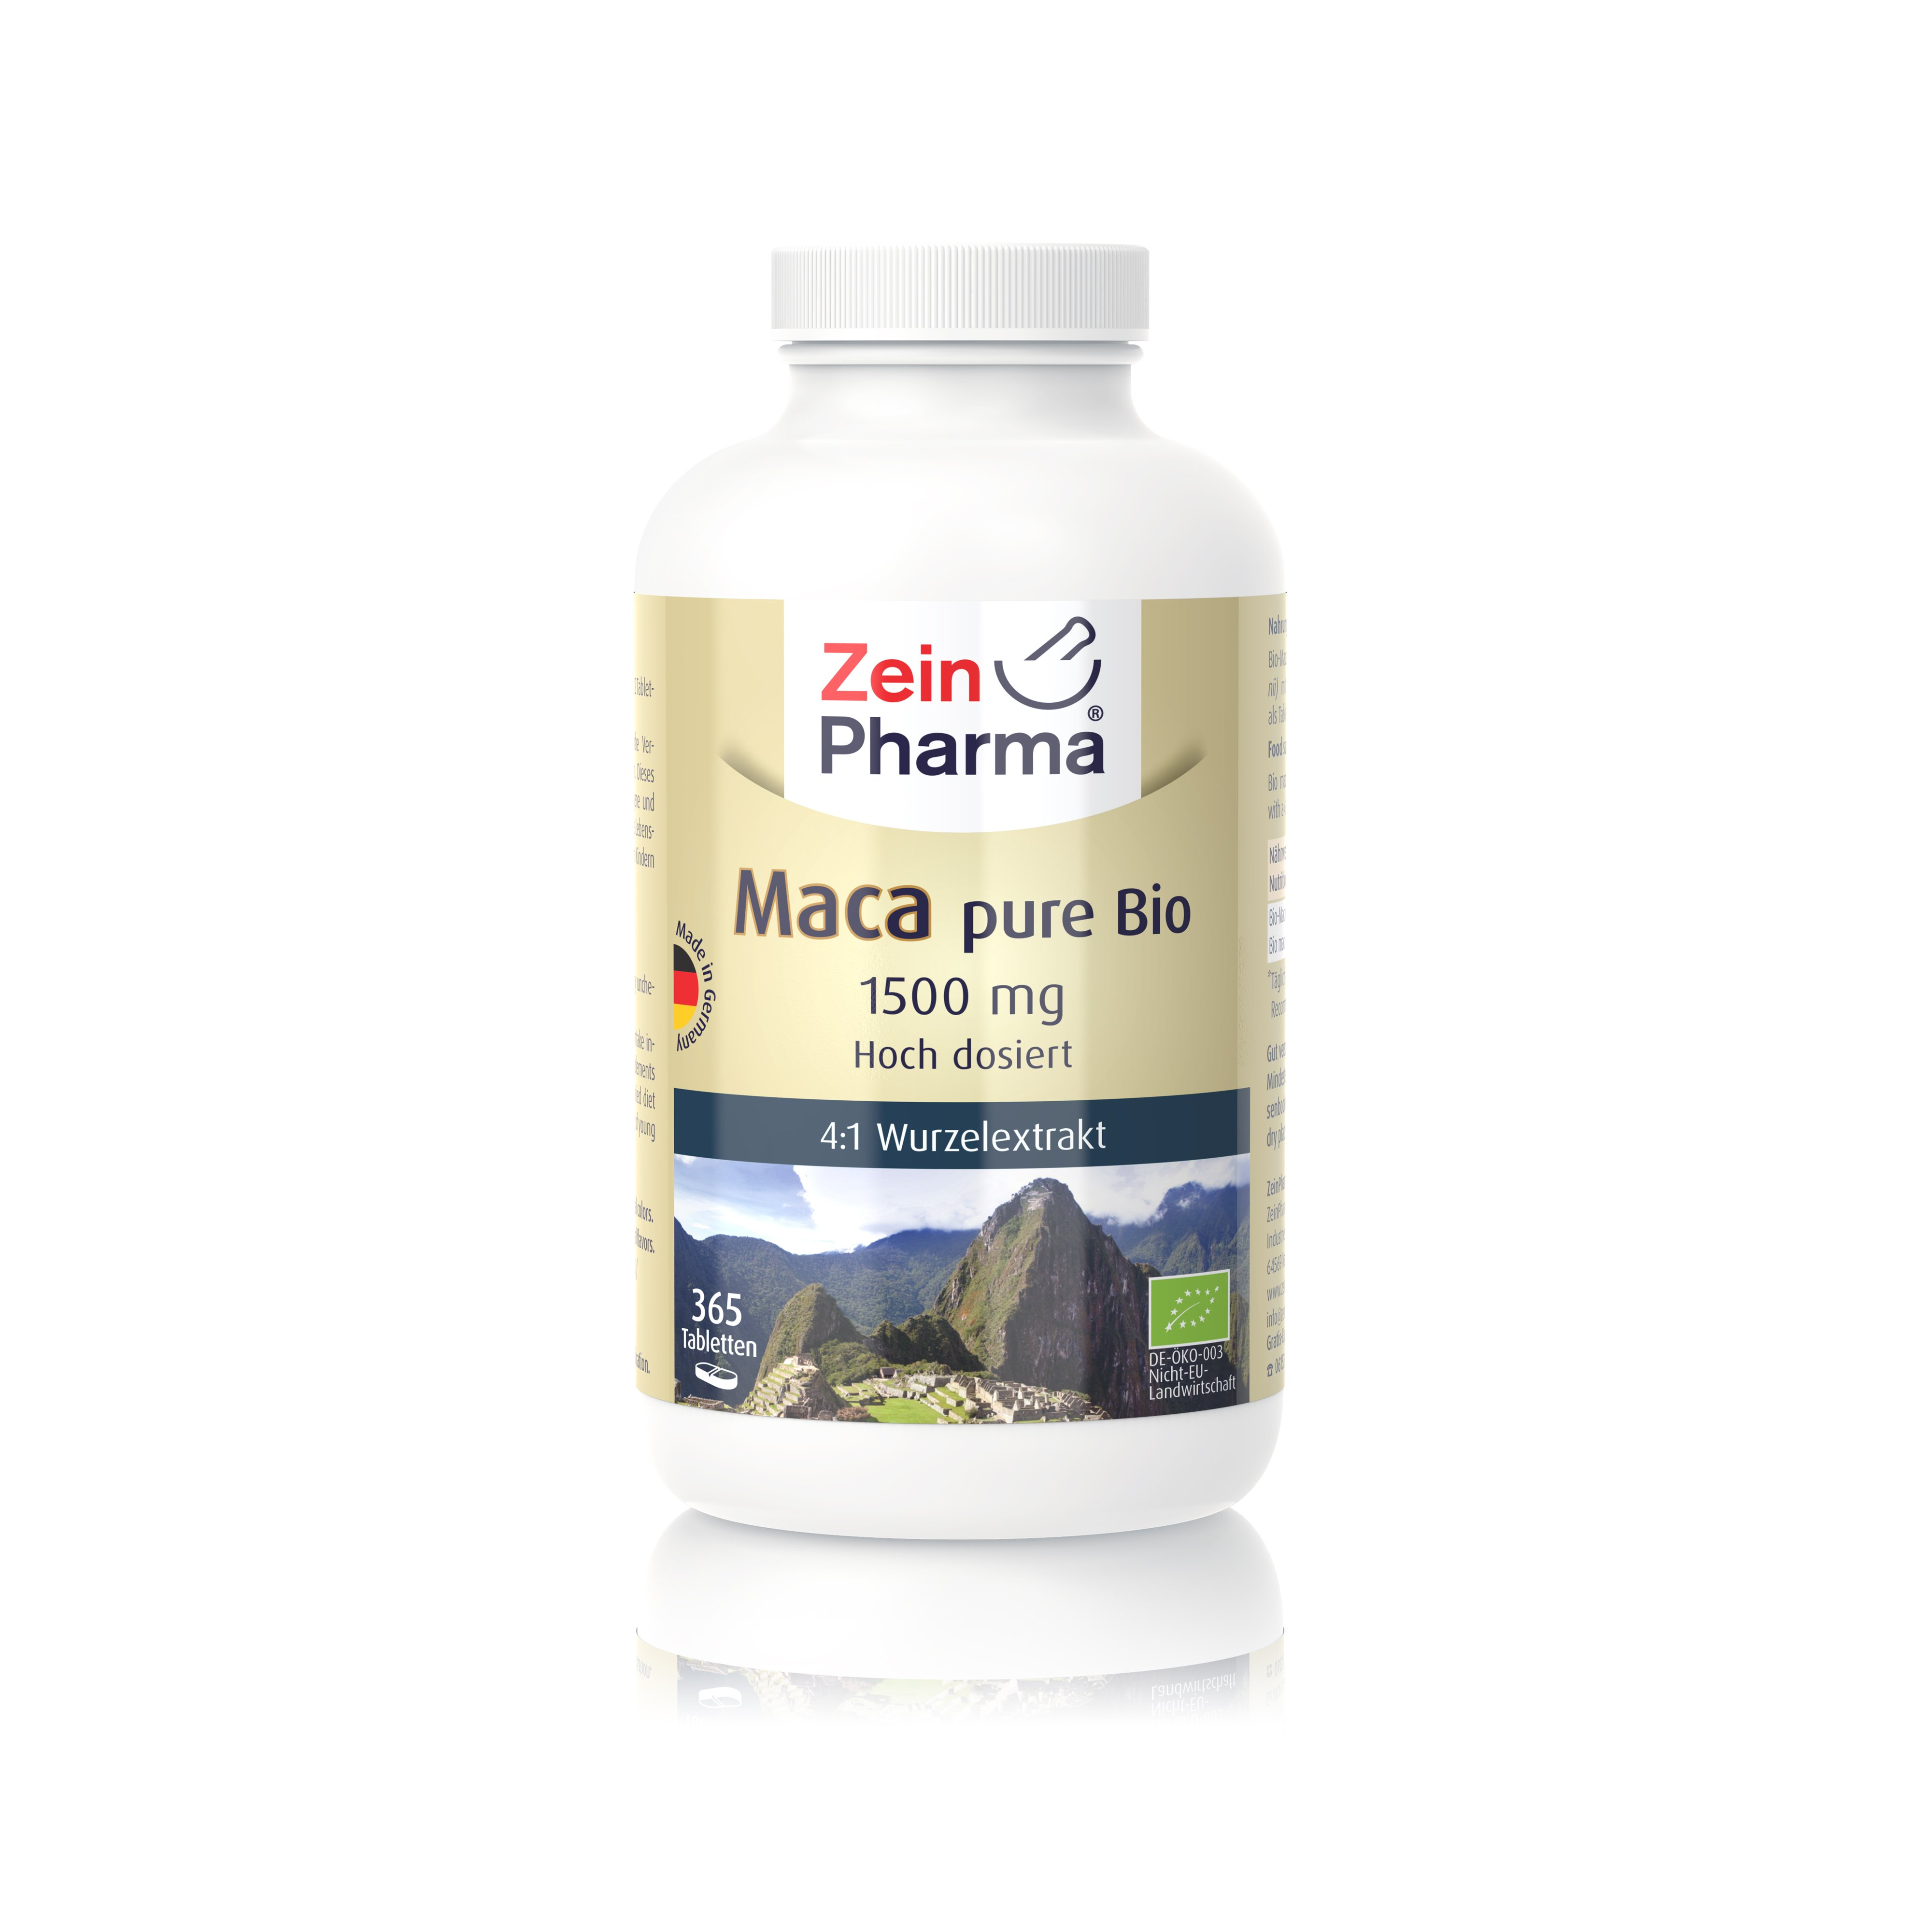 Maca pure Bio 1500 mg - 365 Tabletten